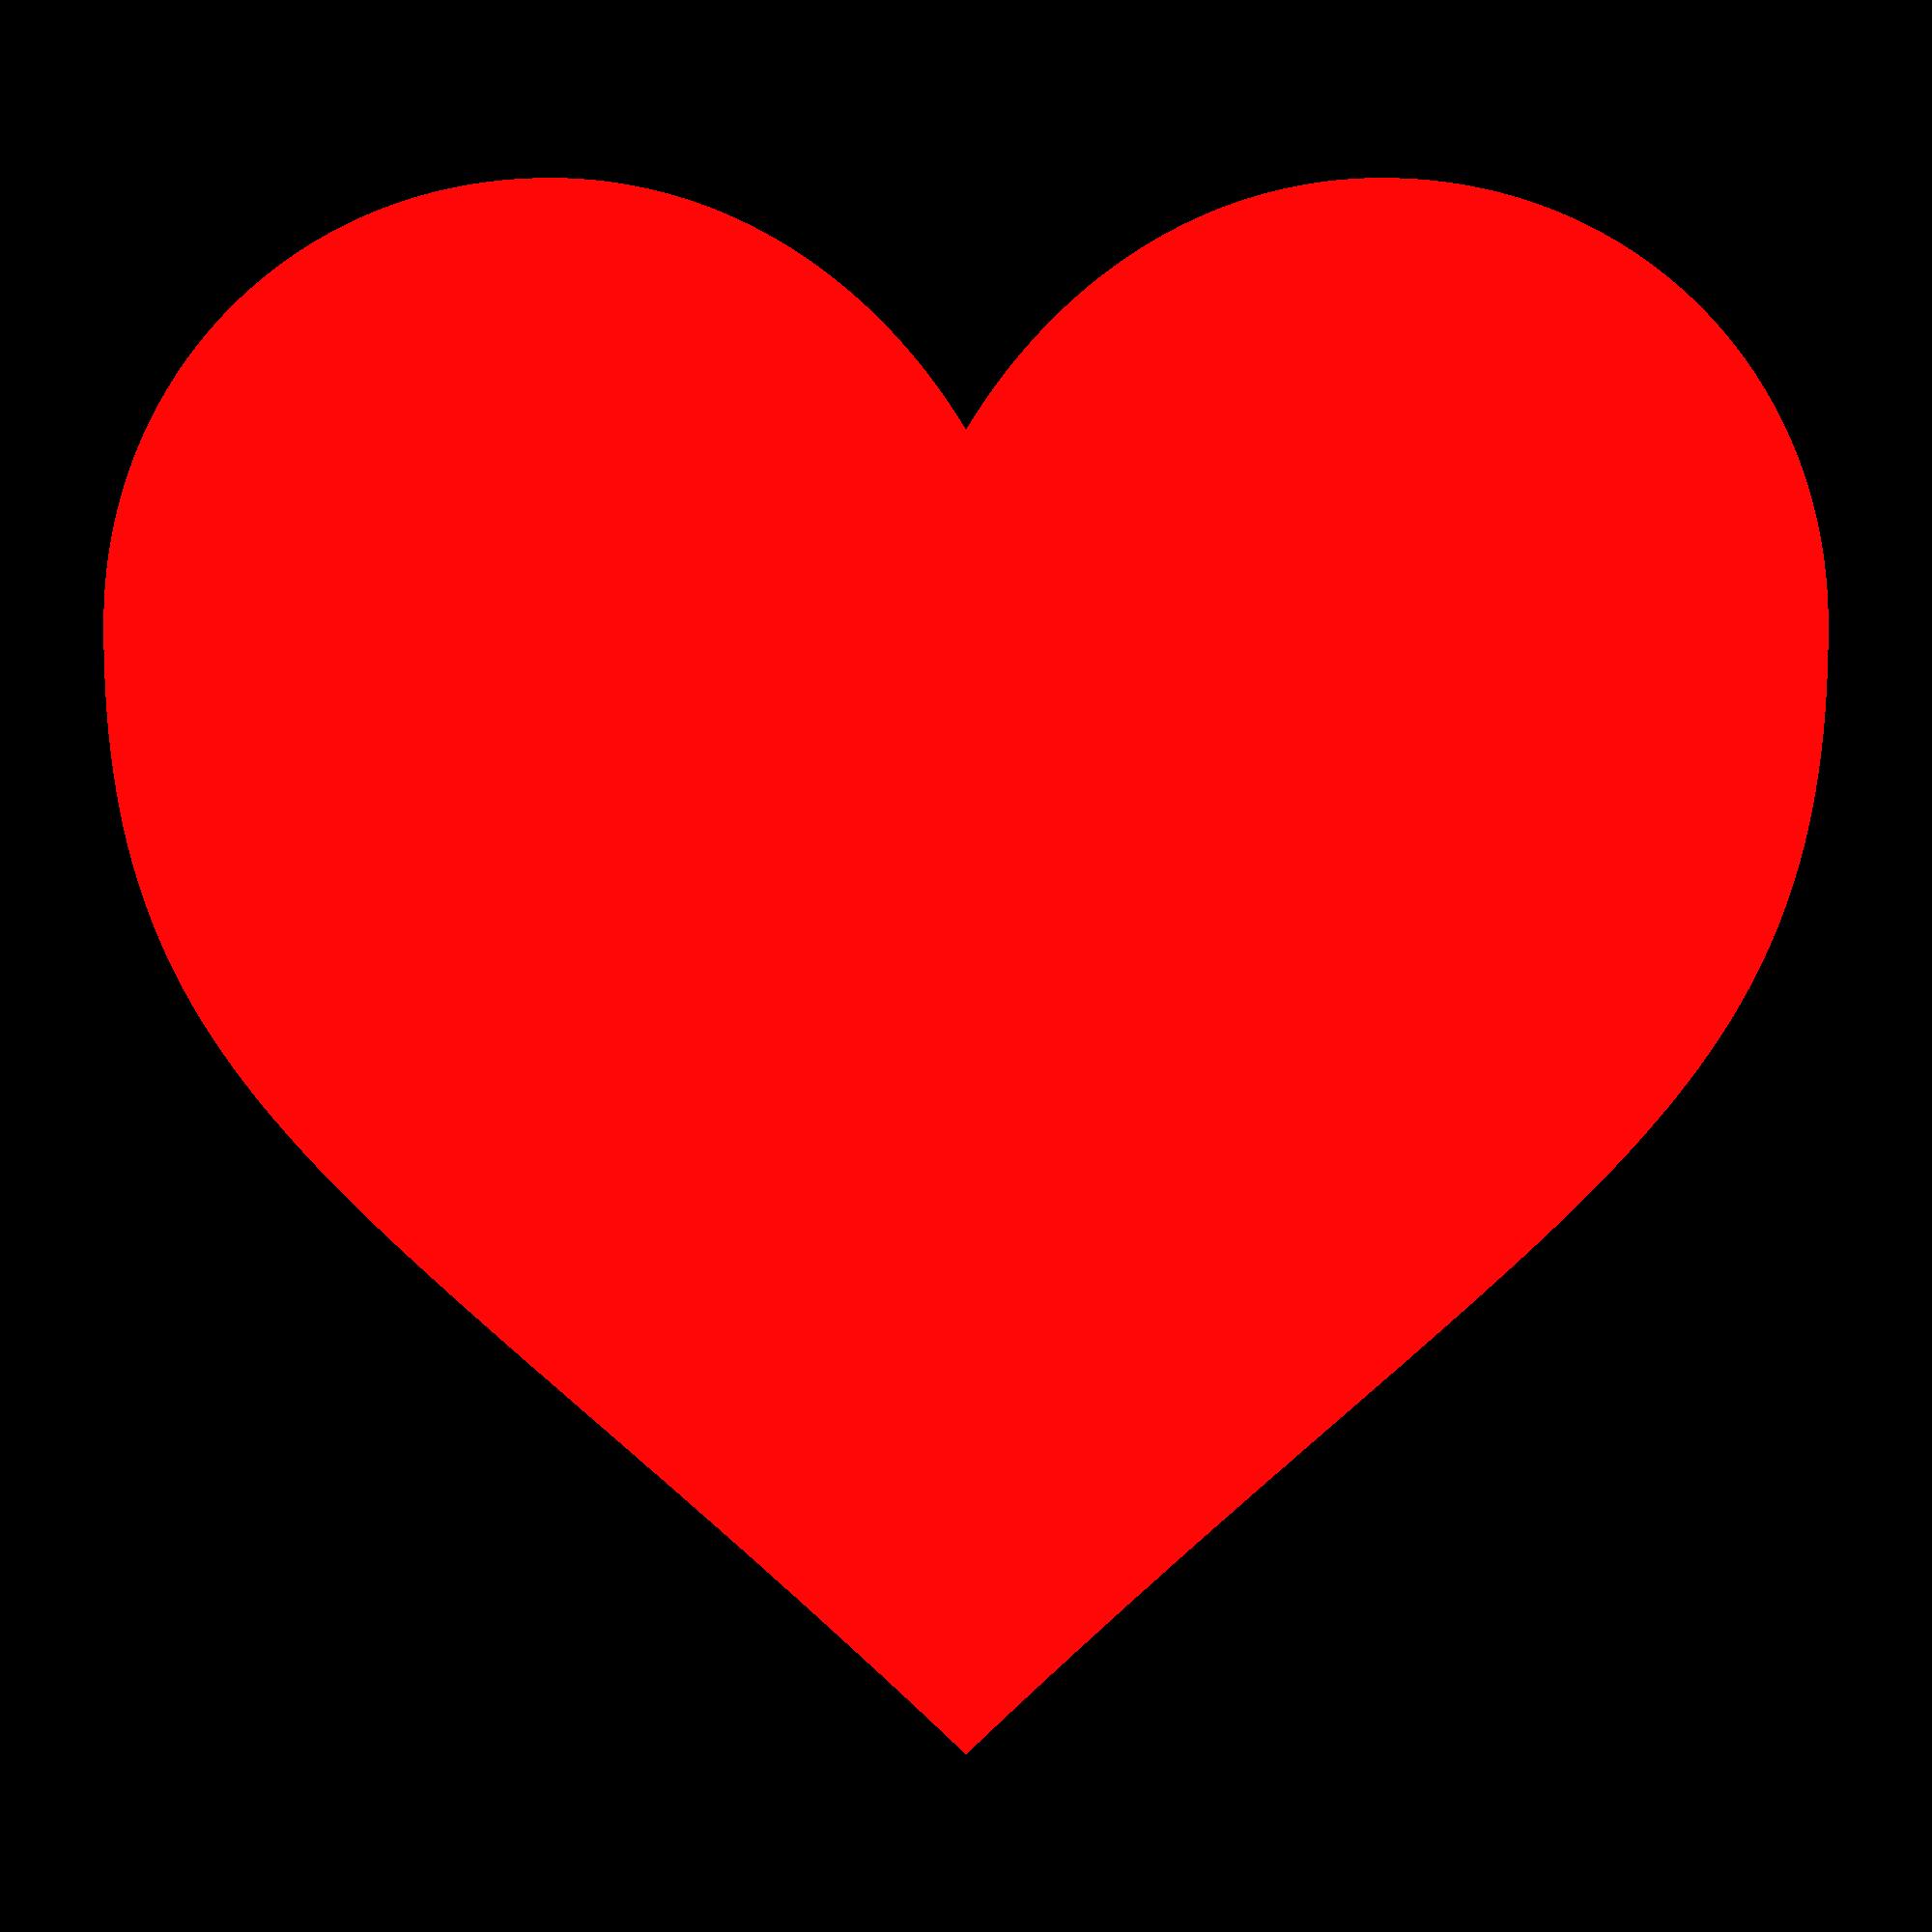 The heart - Maasbach.com